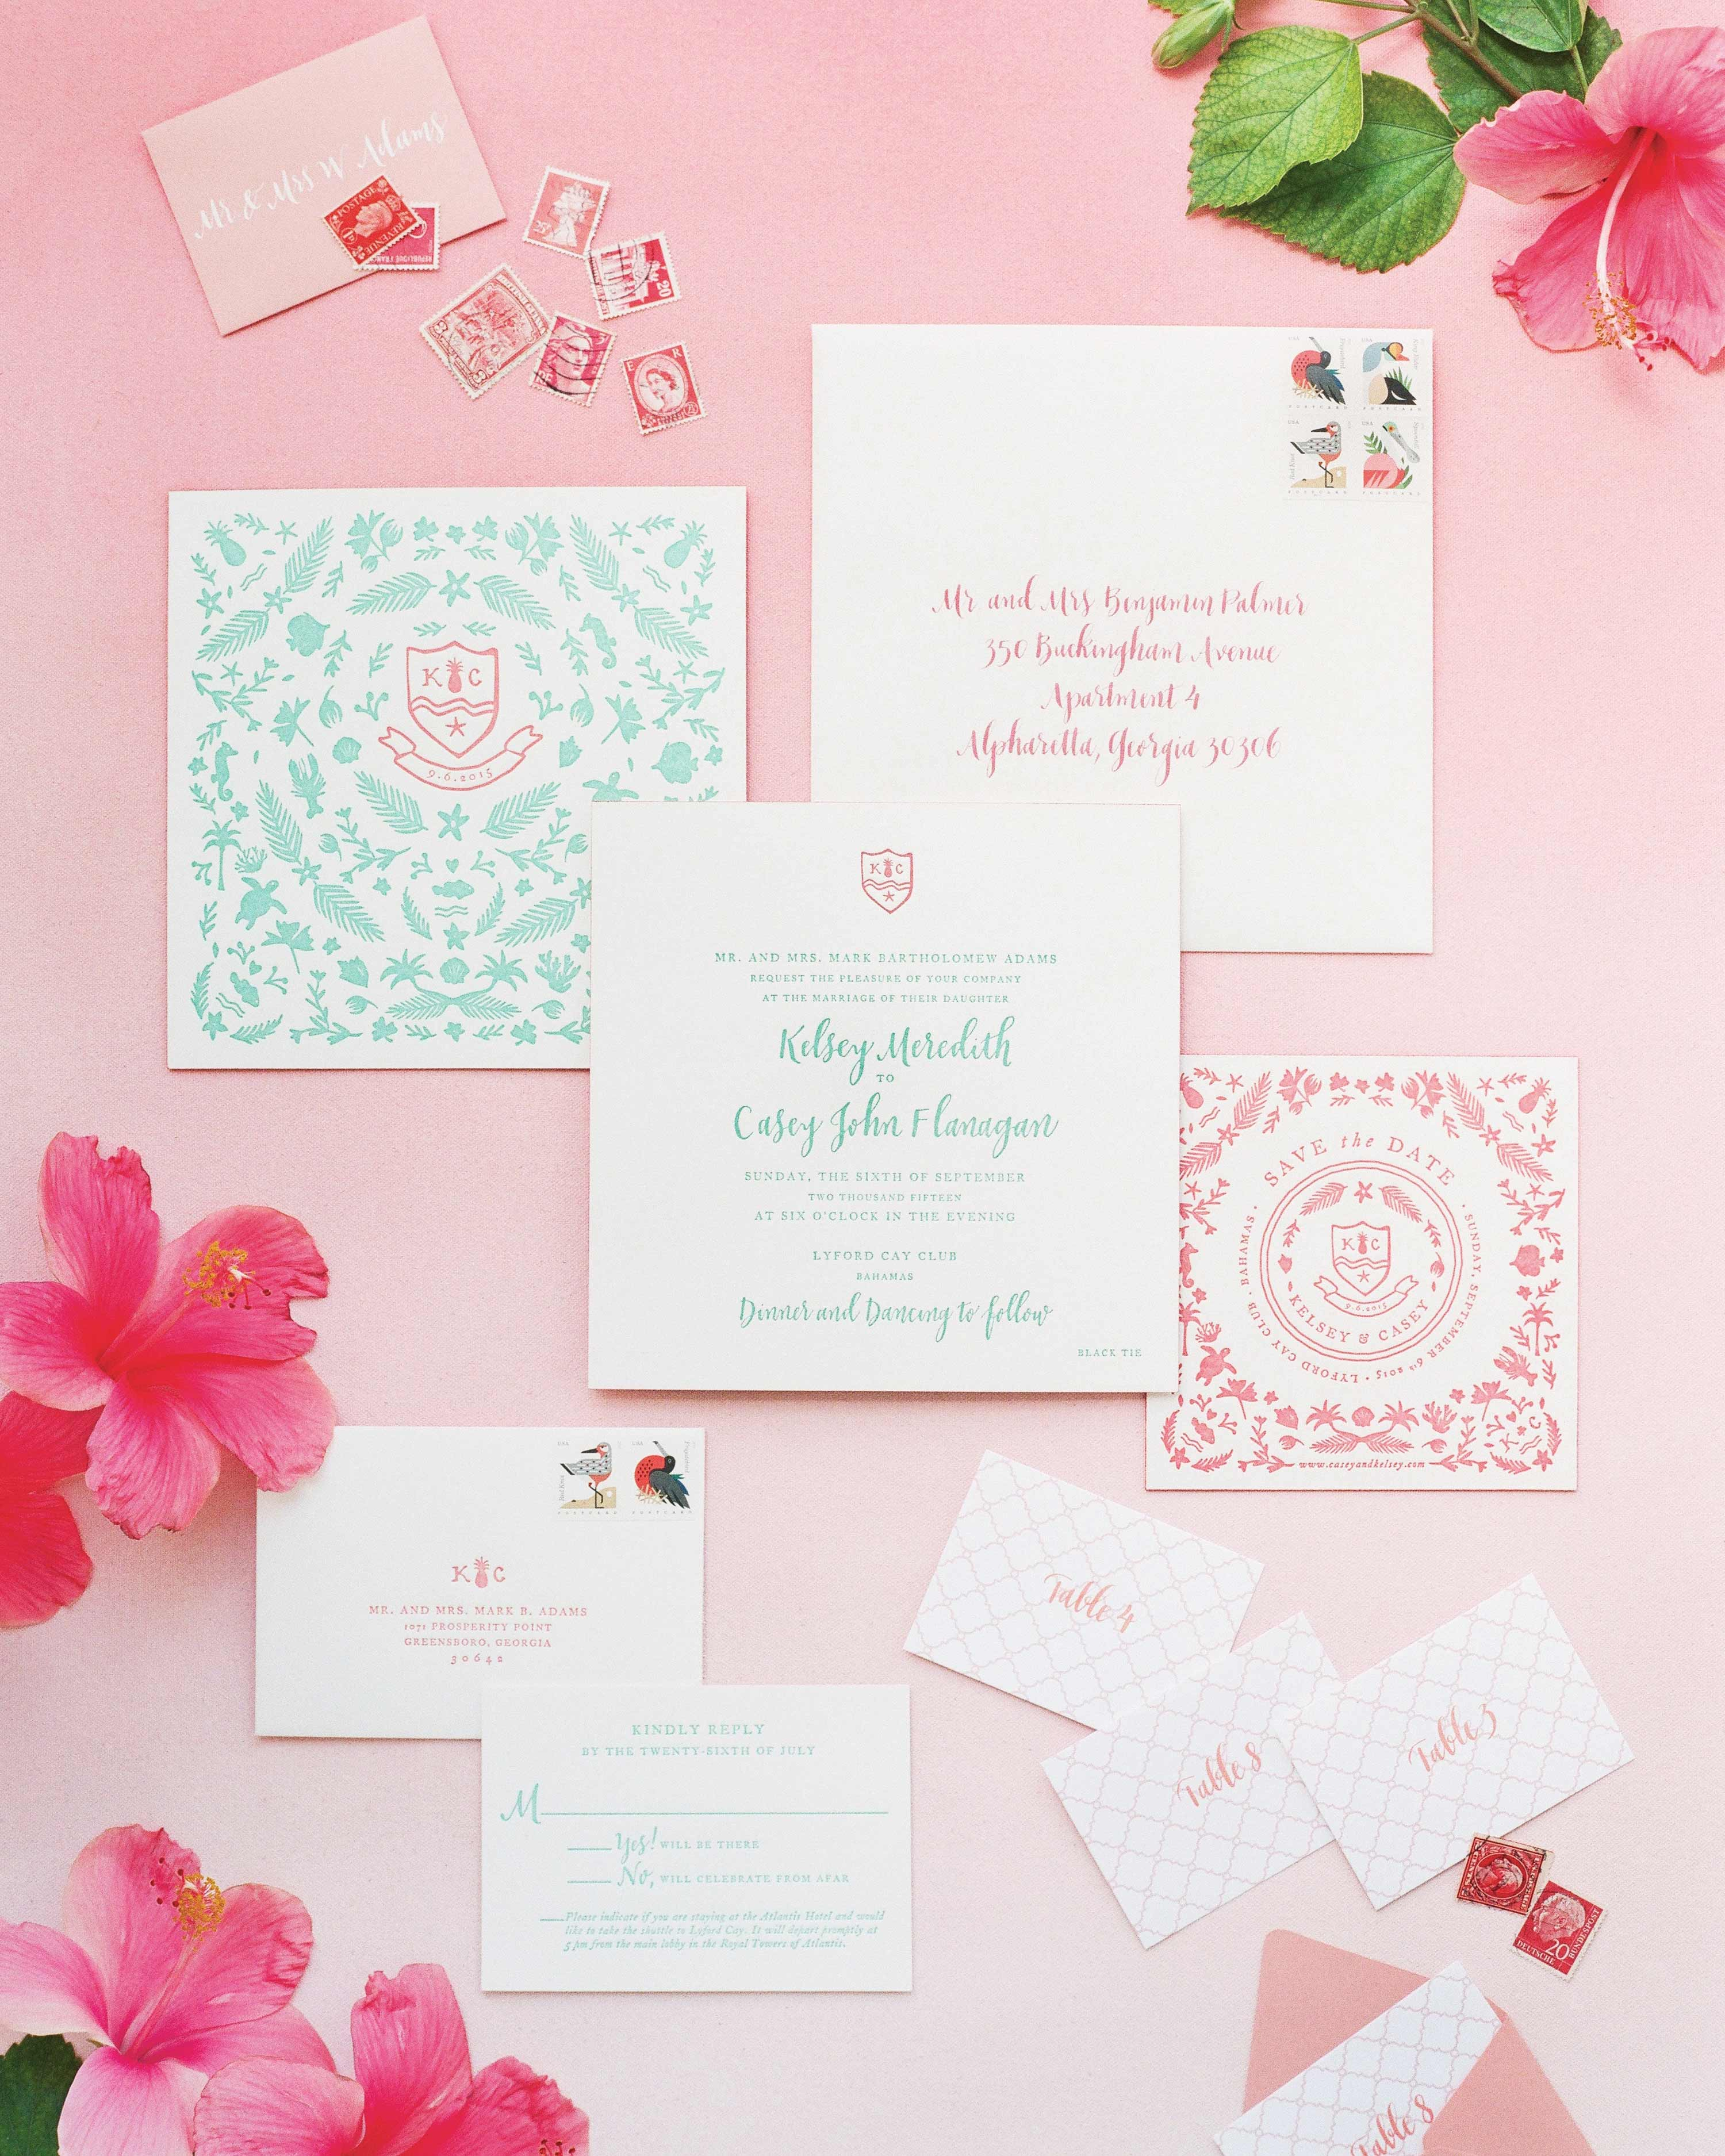 kelsey-casey-real-wedding-pink-invitations-suite.jpg